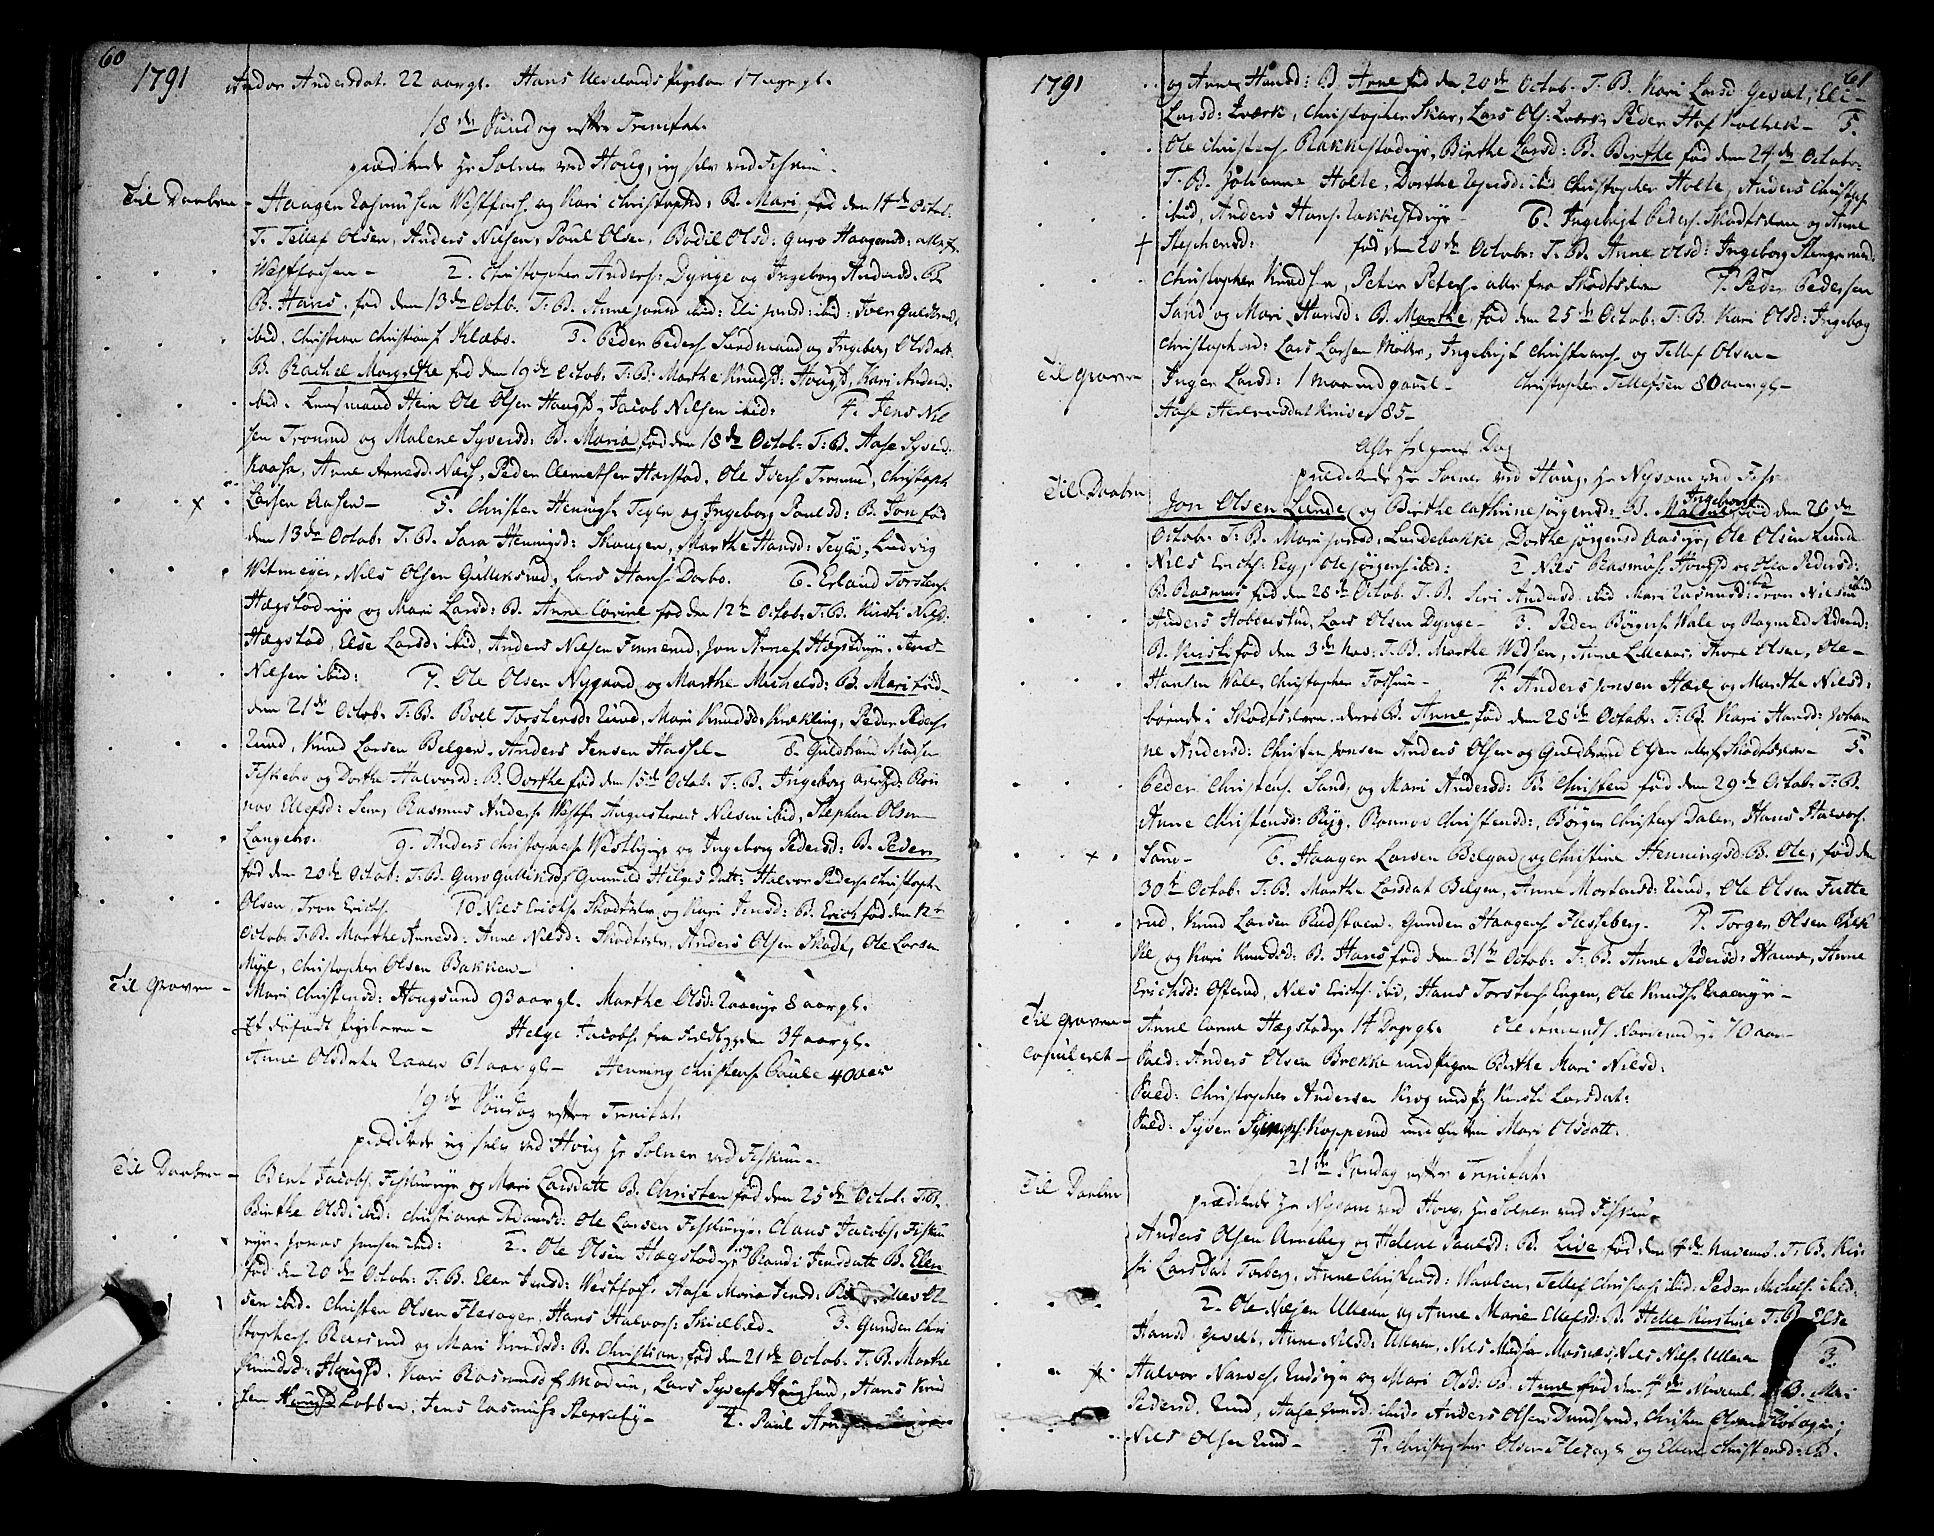 SAKO, Eiker kirkebøker, F/Fa/L0009: Ministerialbok nr. I 9, 1789-1806, s. 60-61